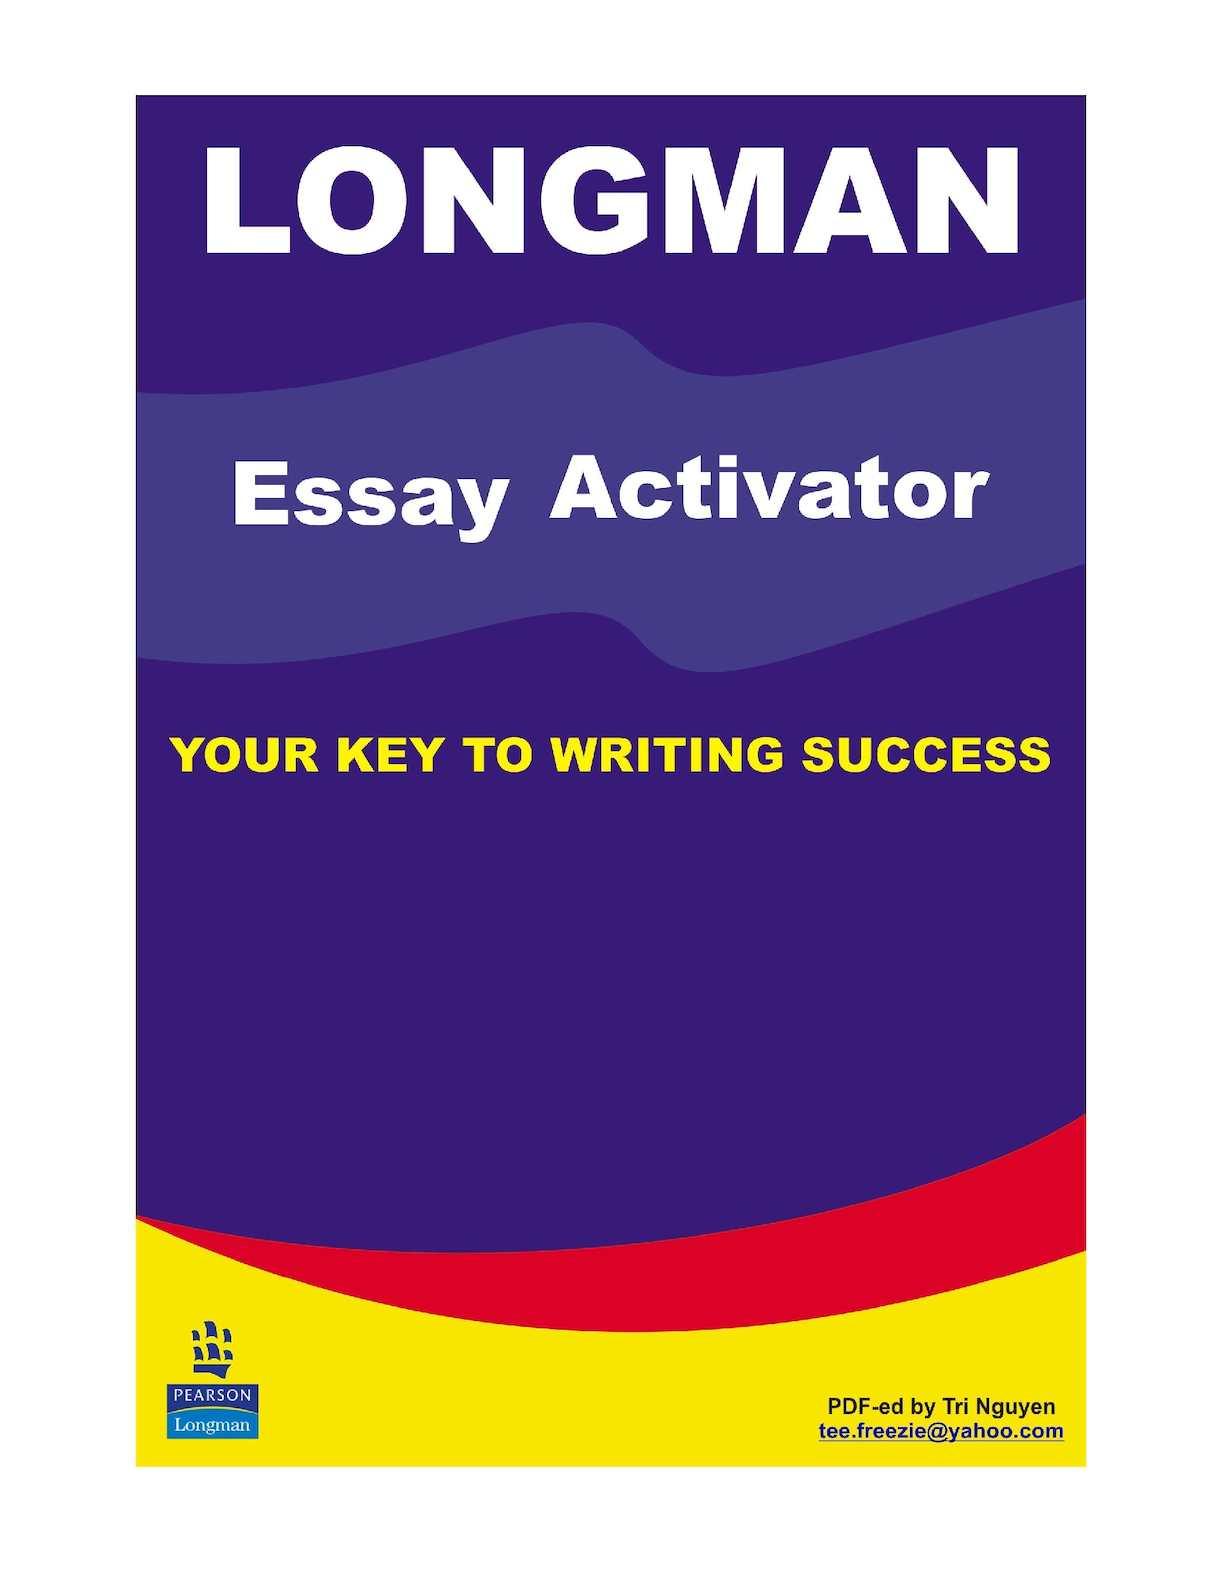 Longman Essay Activator - CALAMEO Downloader